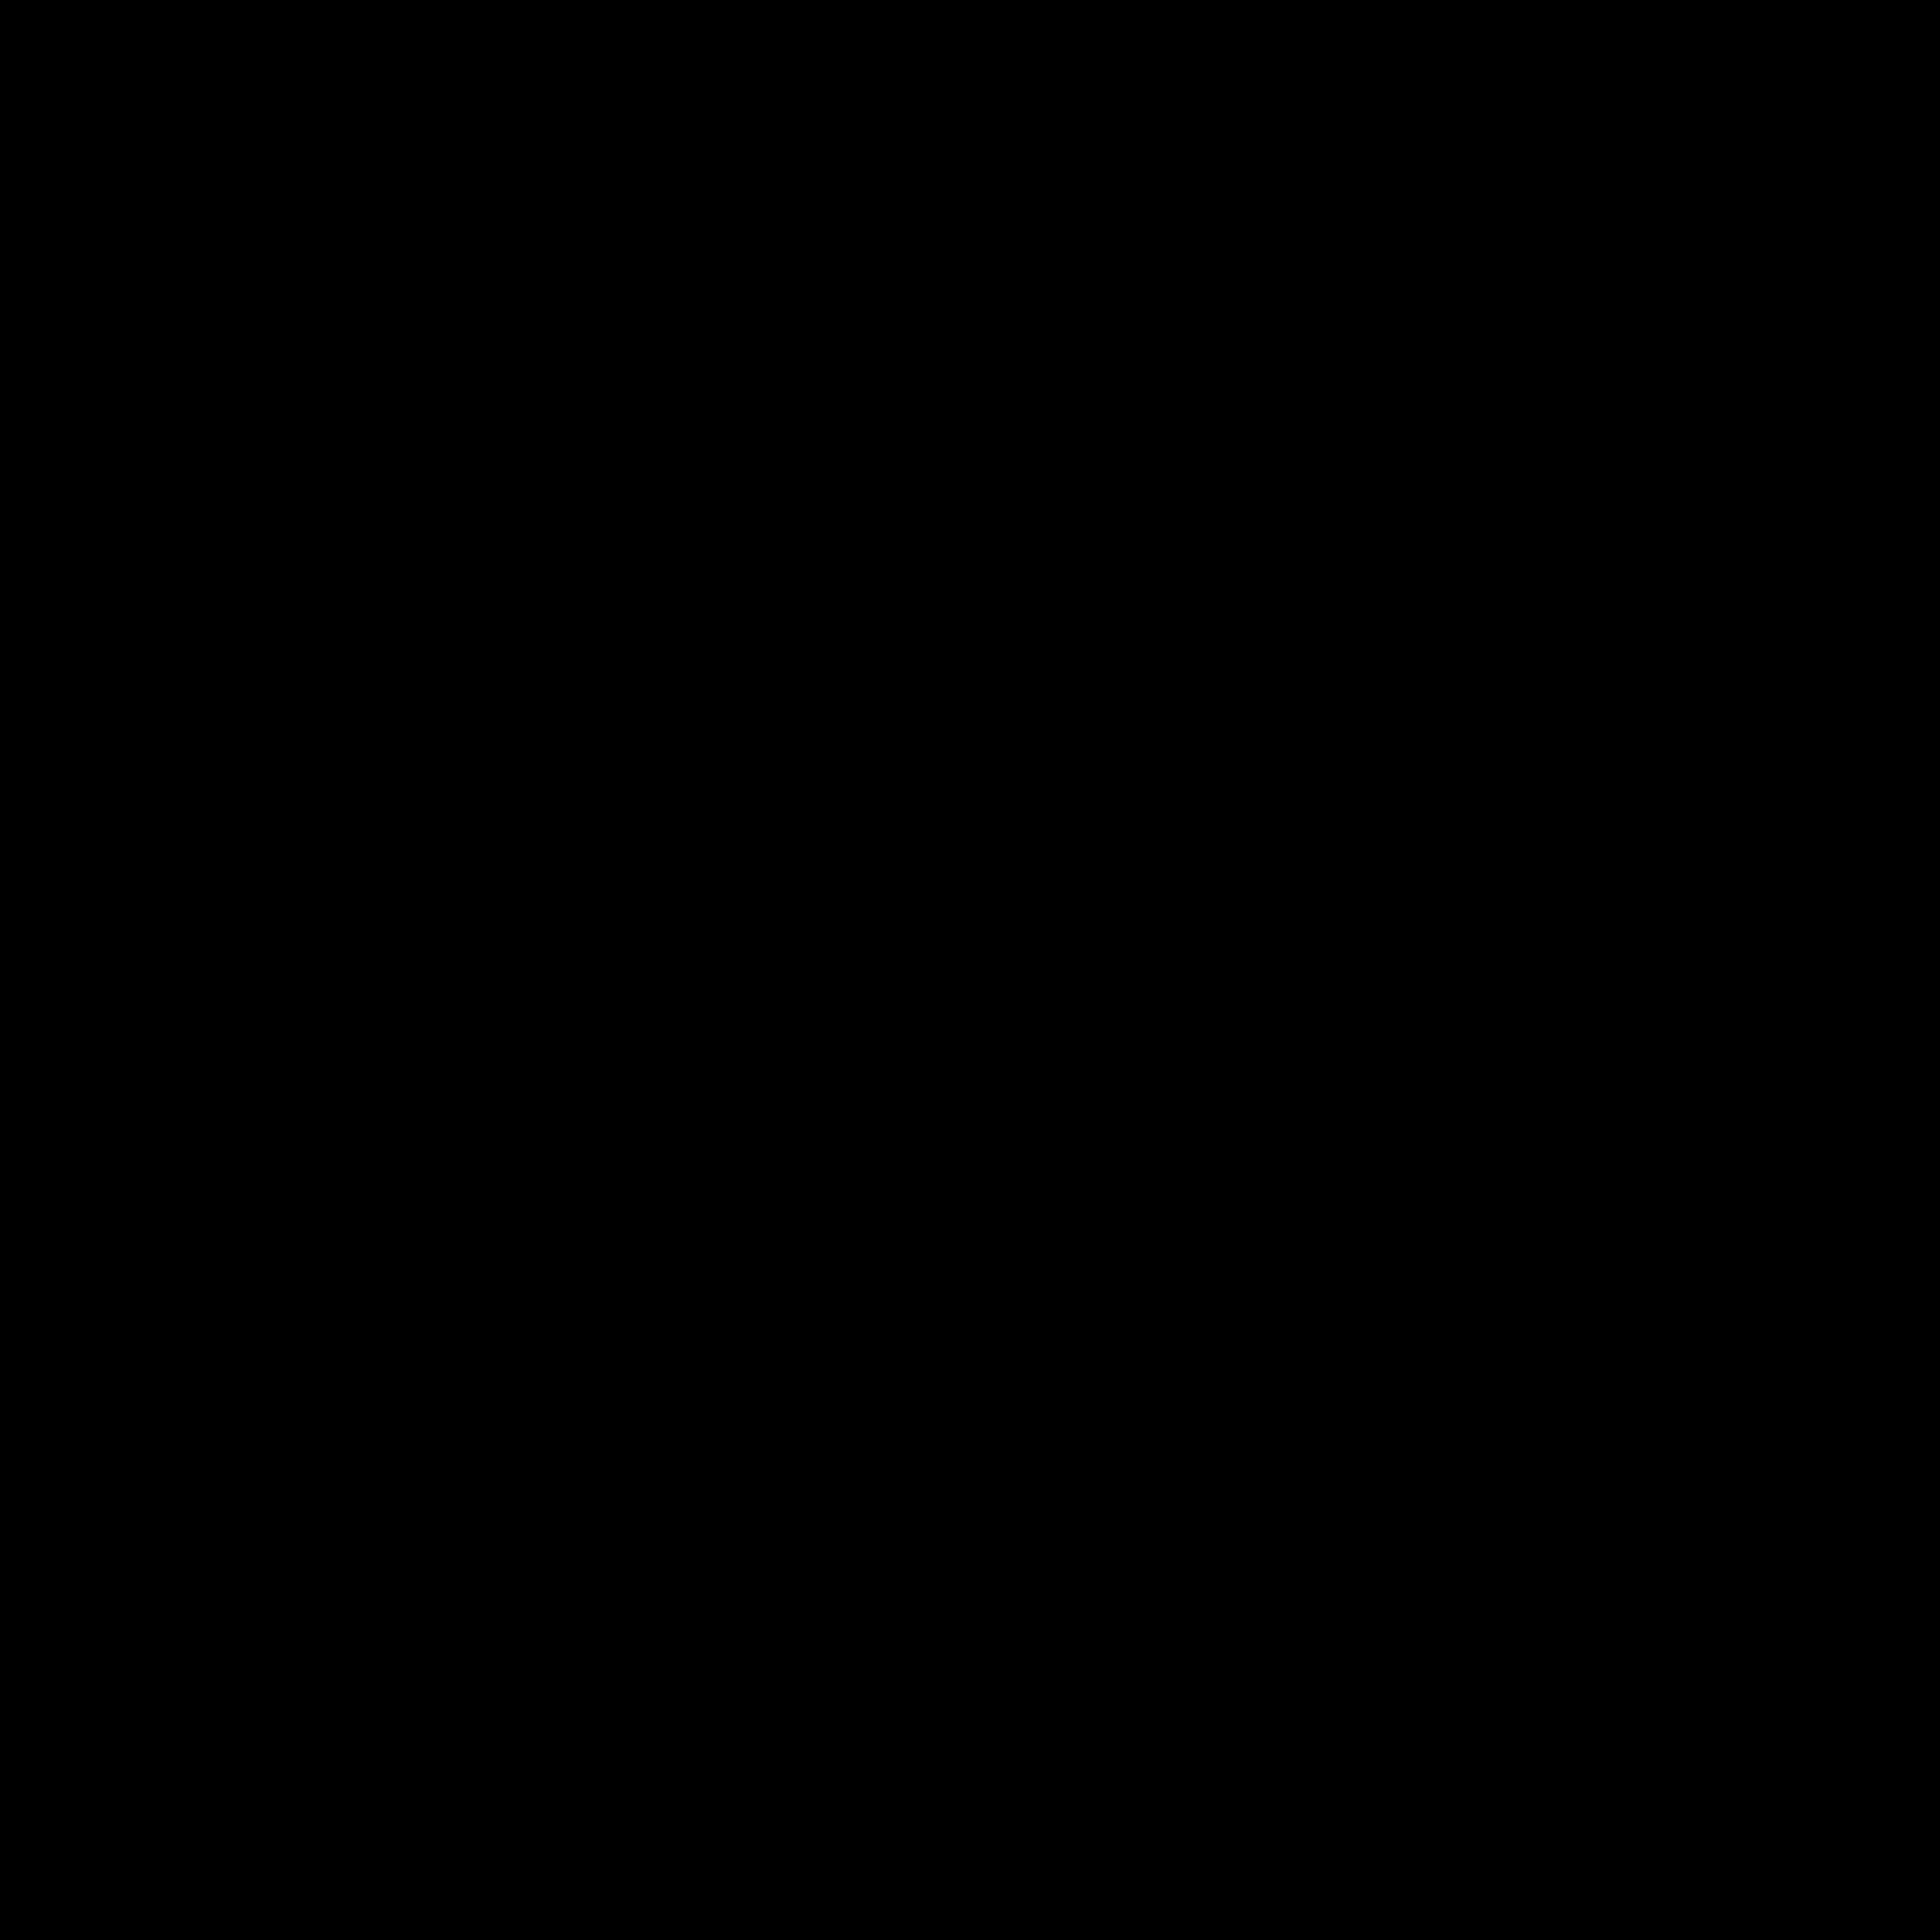 patrickmazzolo_logo_black.png